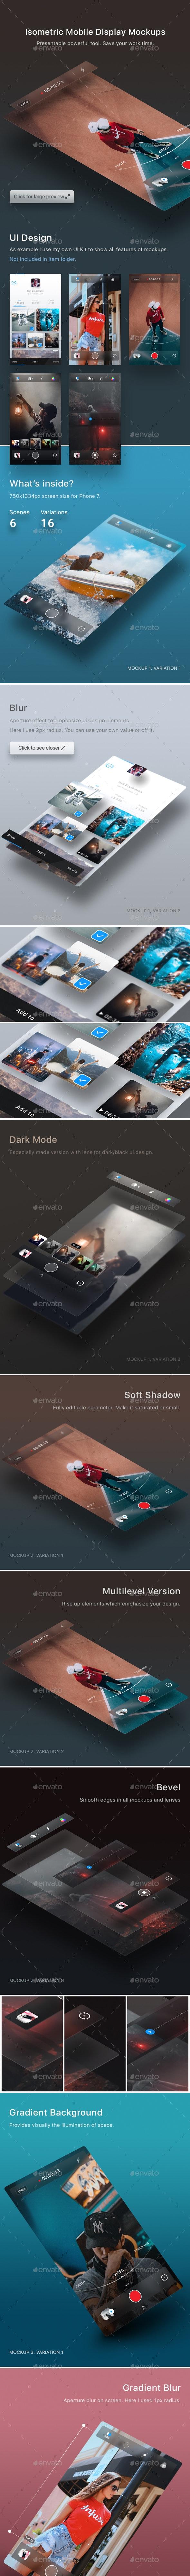 Isometric Mobile Display Mockups - Mobile Displays